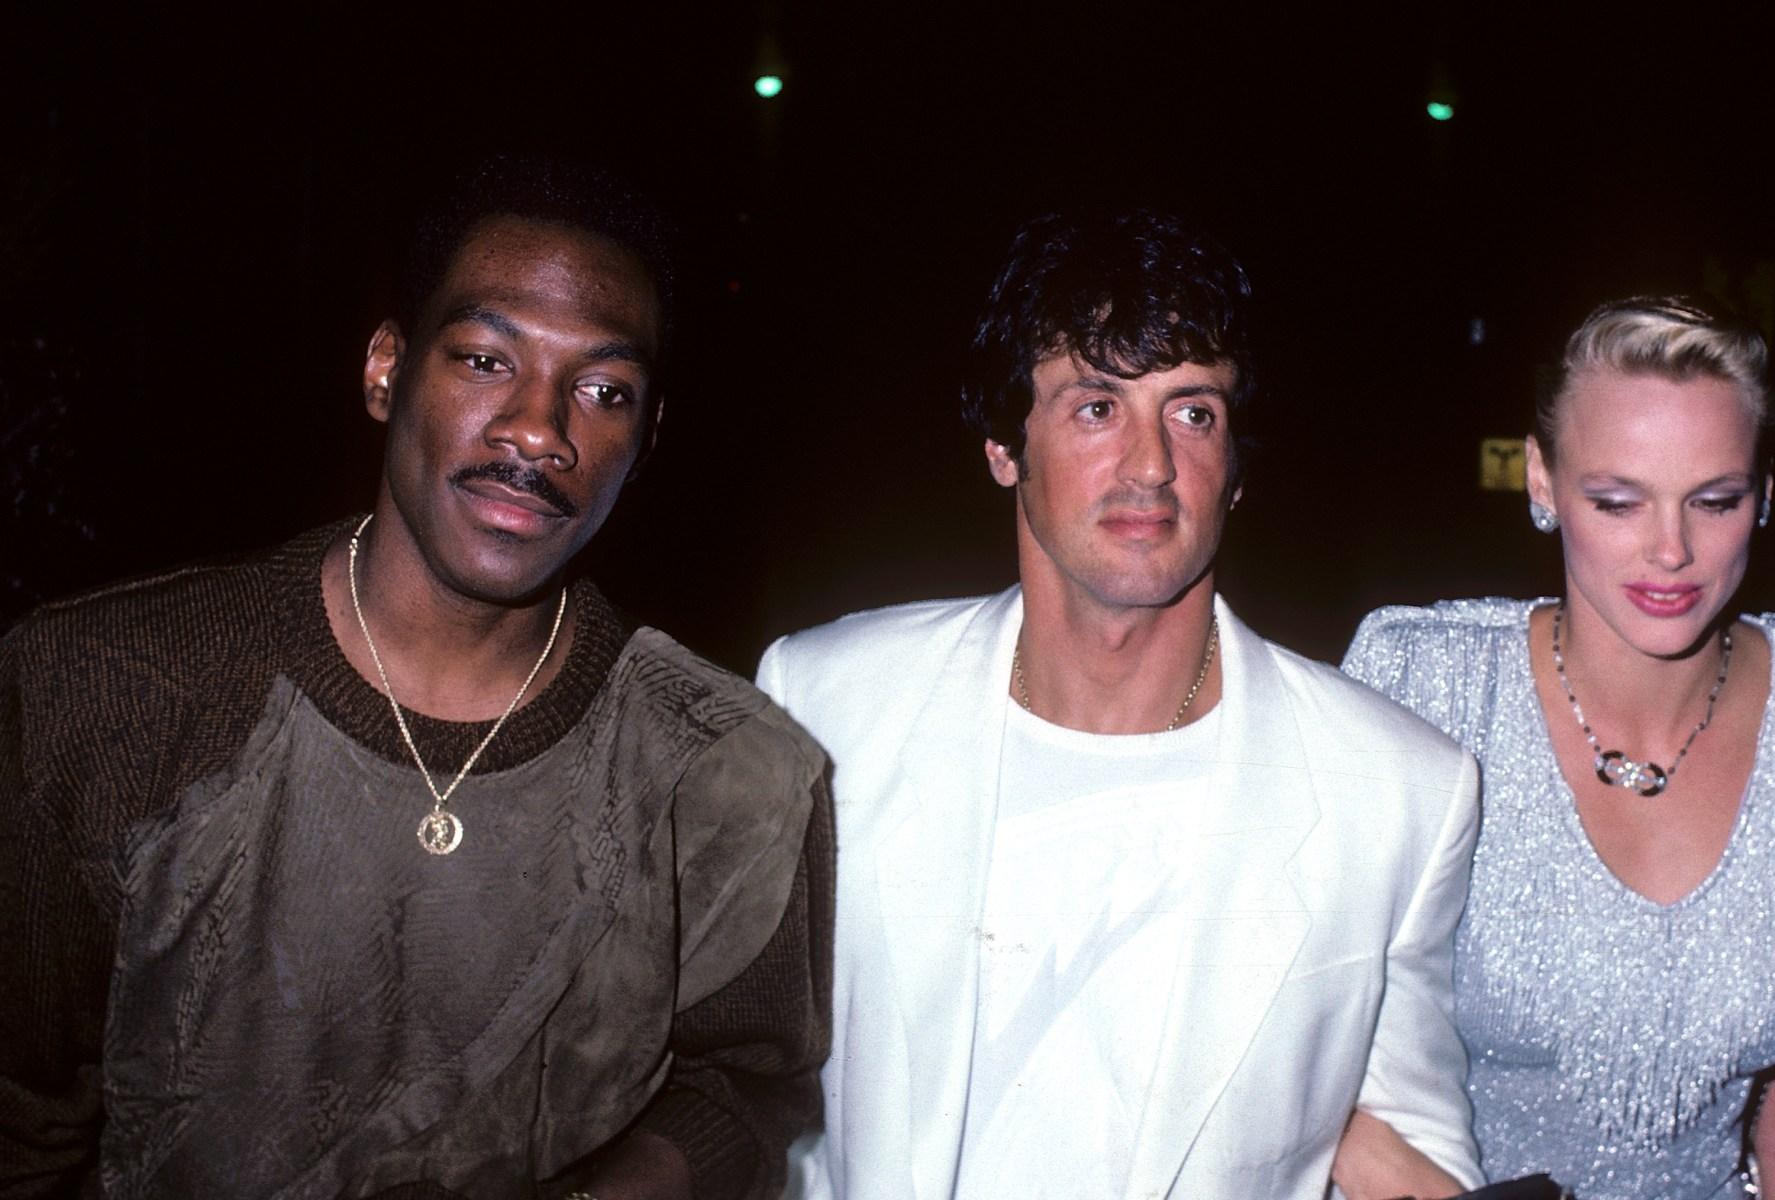 Eddie Murphy, Sylvester Stallone and Brigitte Nielsen in 1986